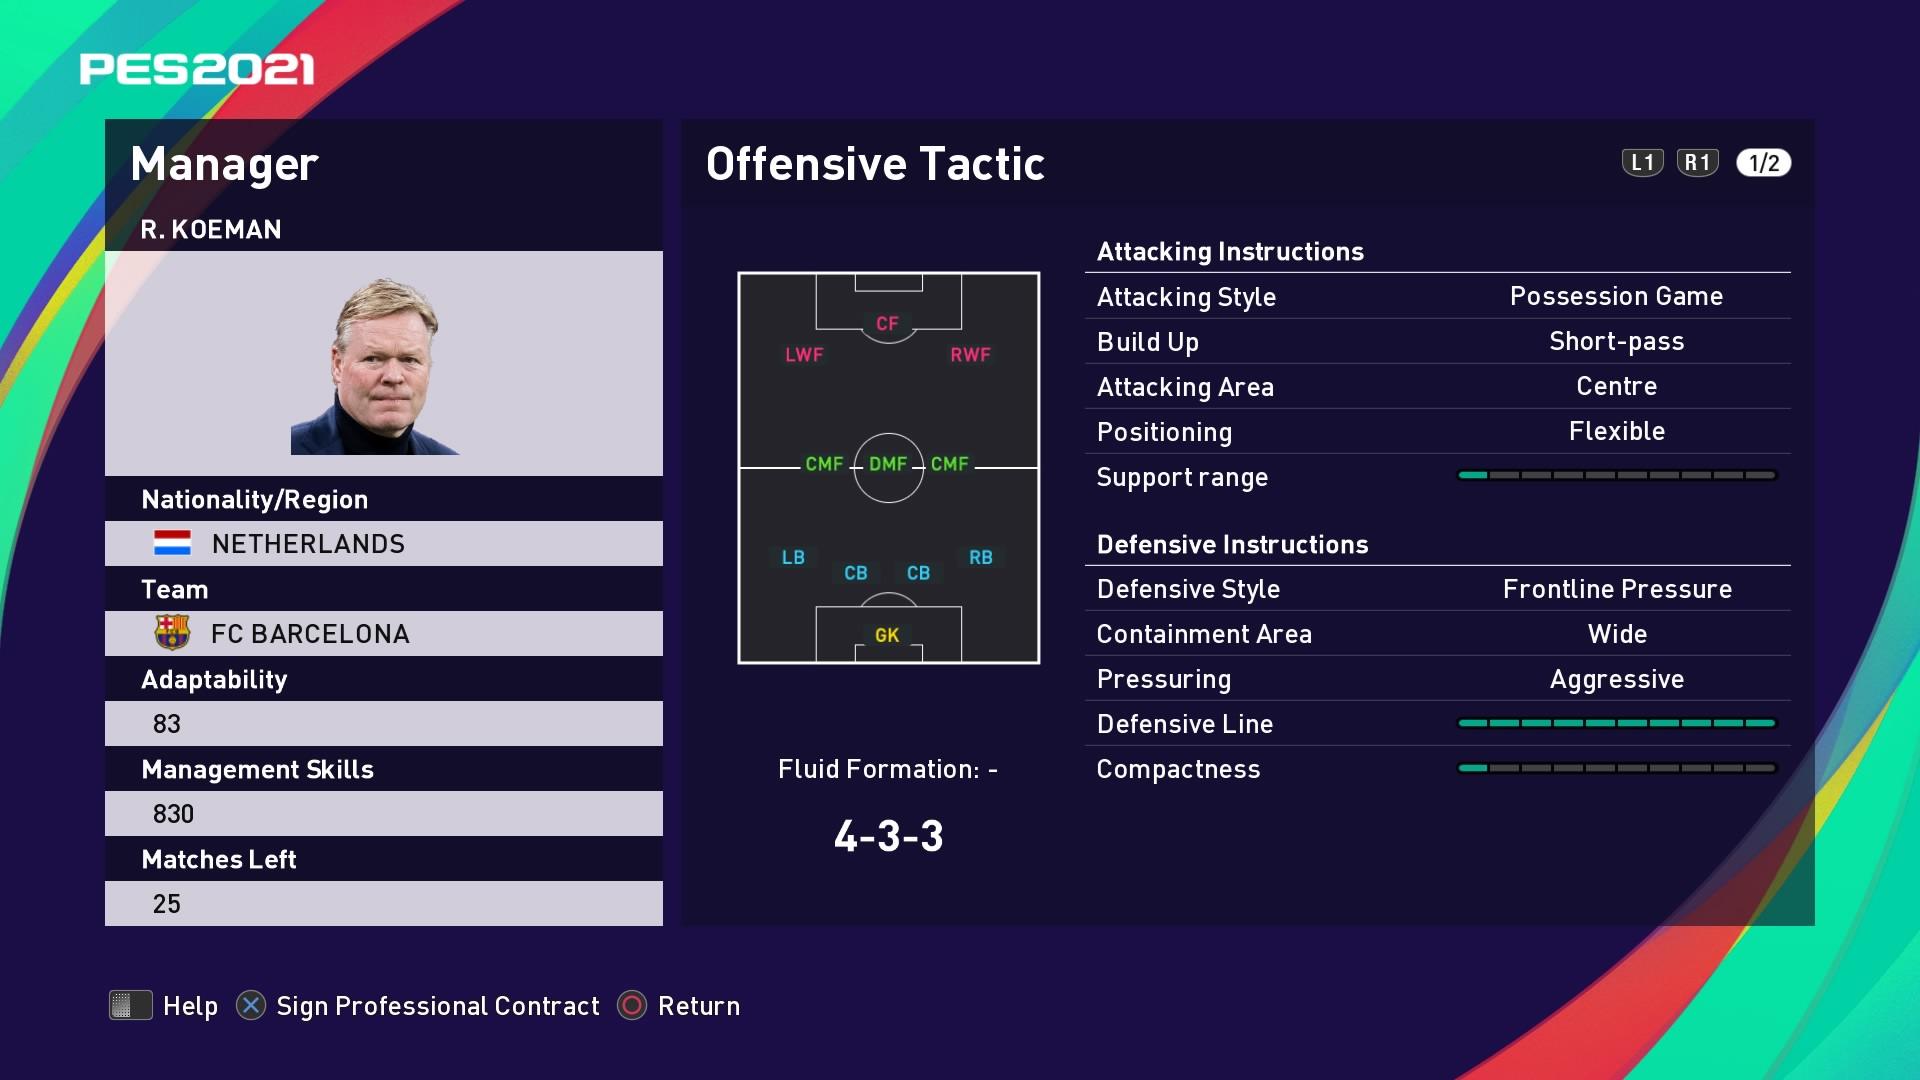 R. Koeman (Ronald Koeman) Offensive Tactic in PES 2021 myClub